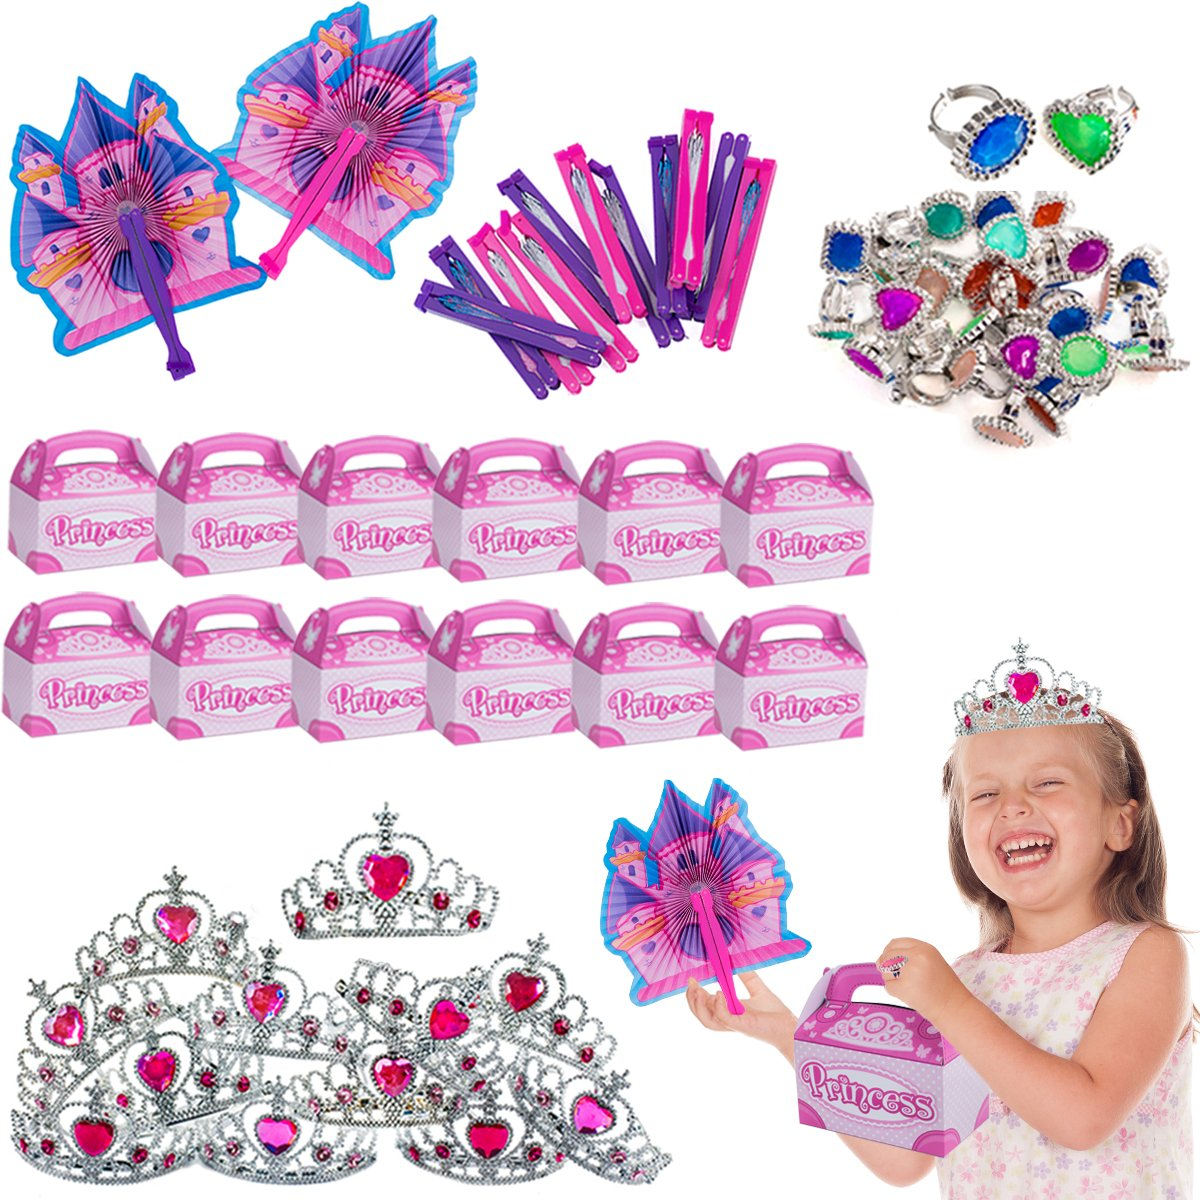 Tiaras Princess Party Supplies 72 Pc Set Party Favors Treat Boxes /& Princess Rings by Funny Party Hats Princess Fans